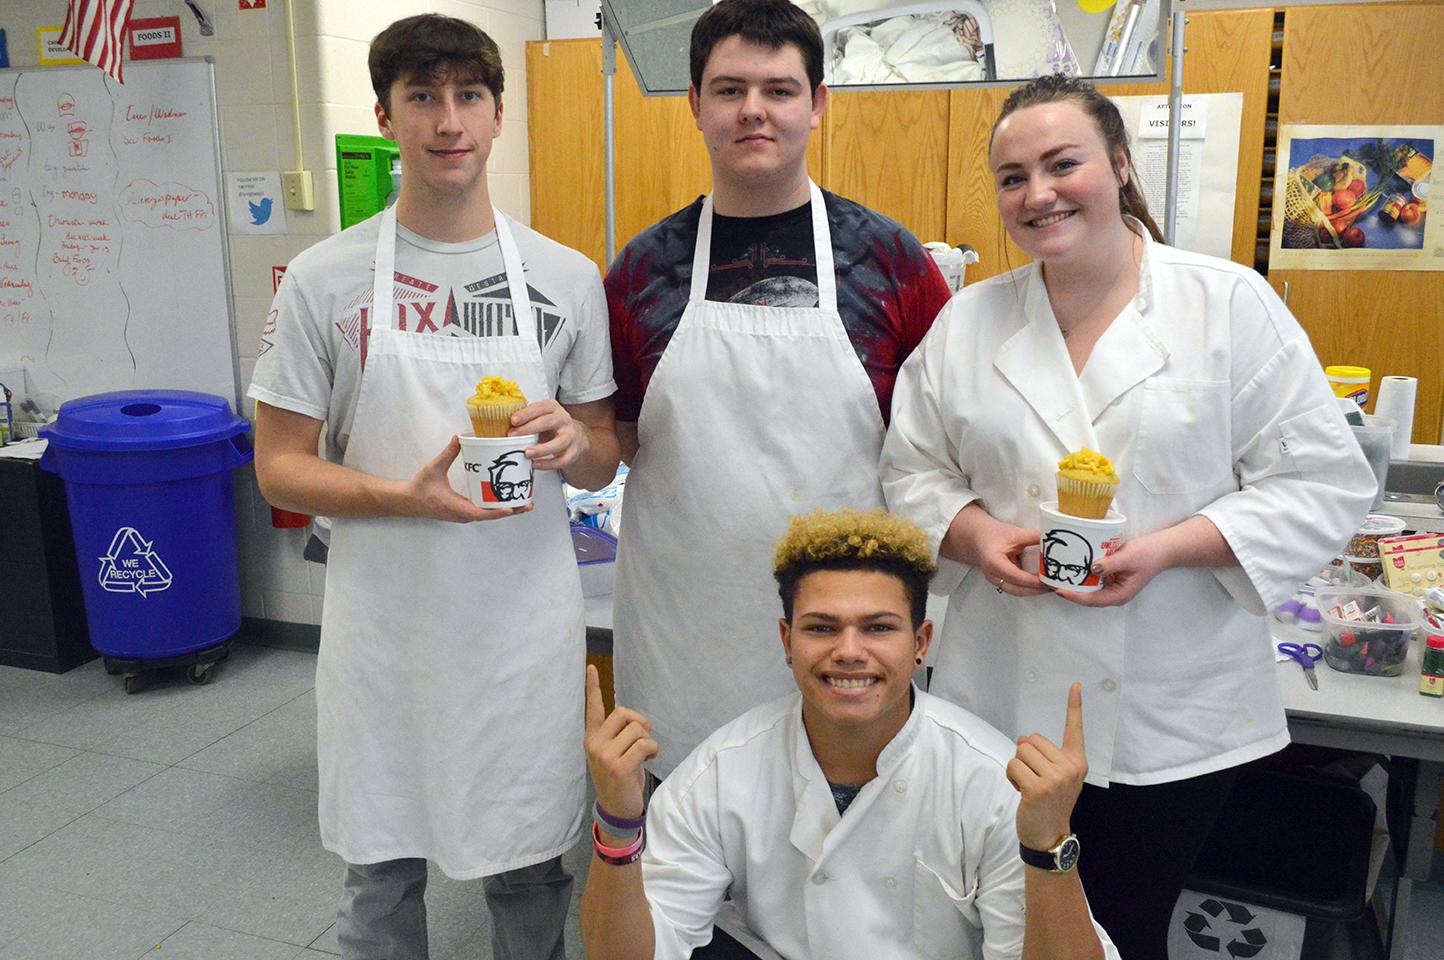 Winner for Presentation - Colonel's Cupcake